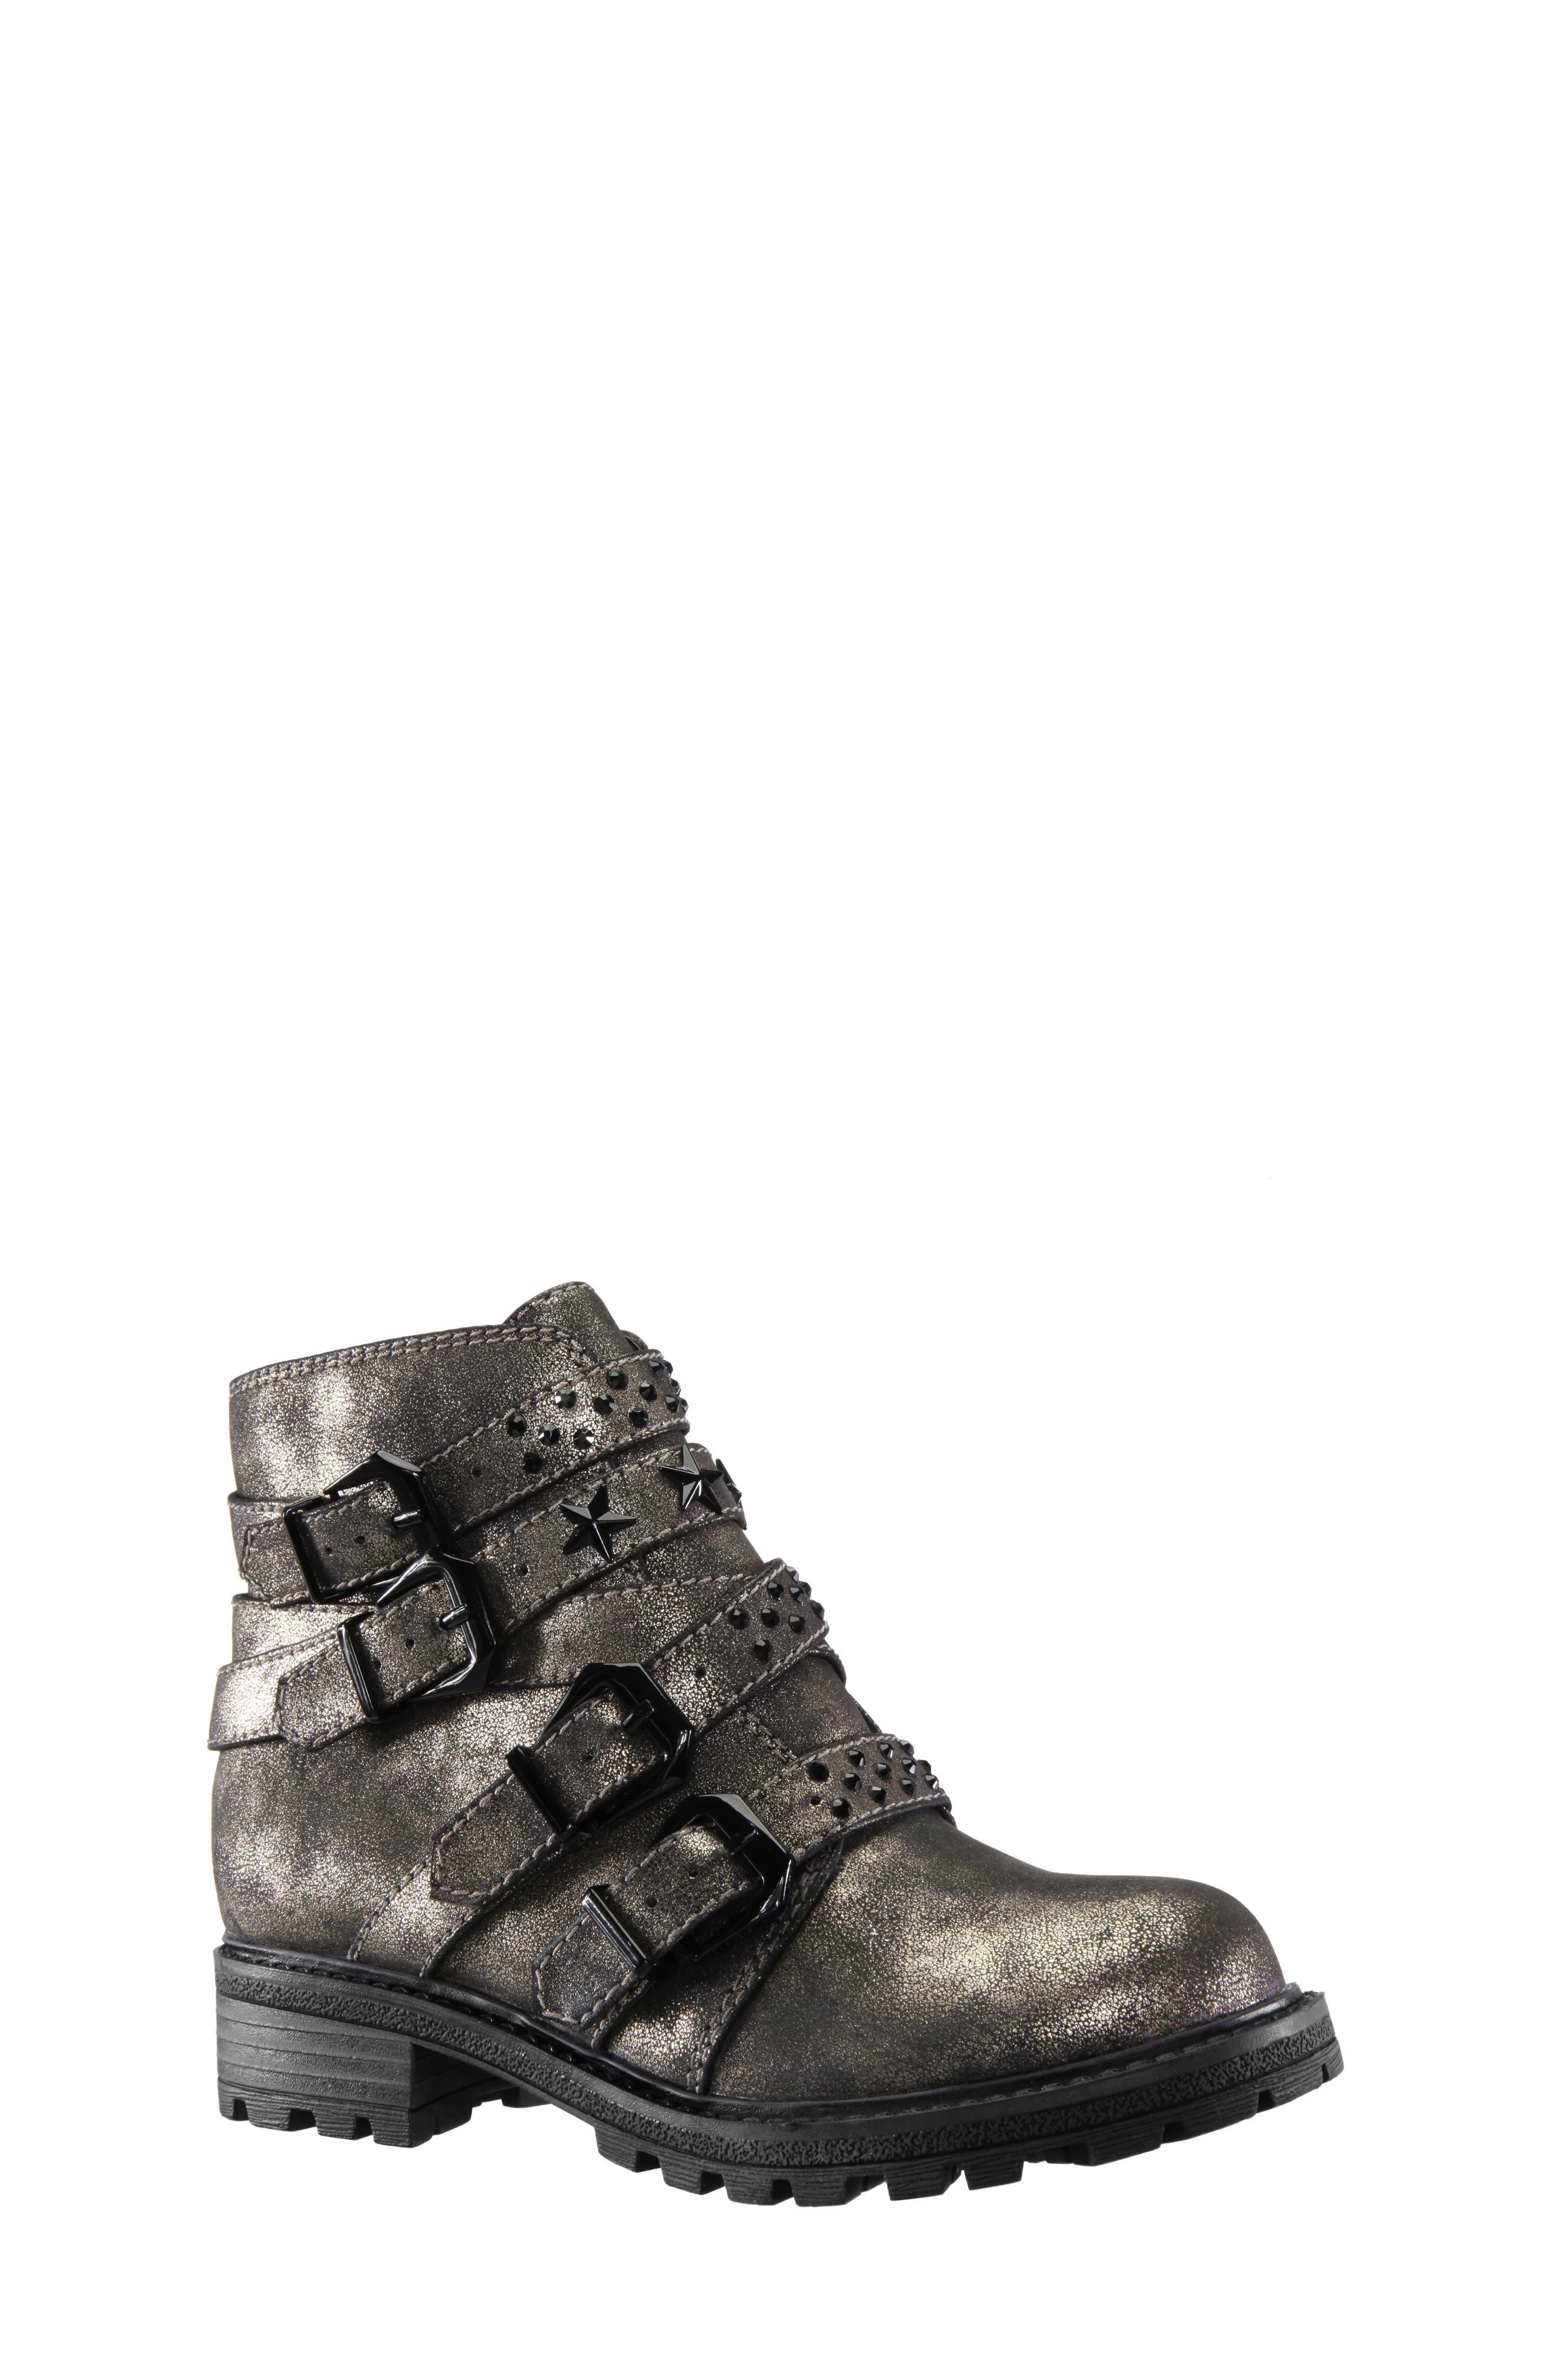 Toddler Girls Nina Wenona Sparkle Buckle Boot Size 12 M  Metallic